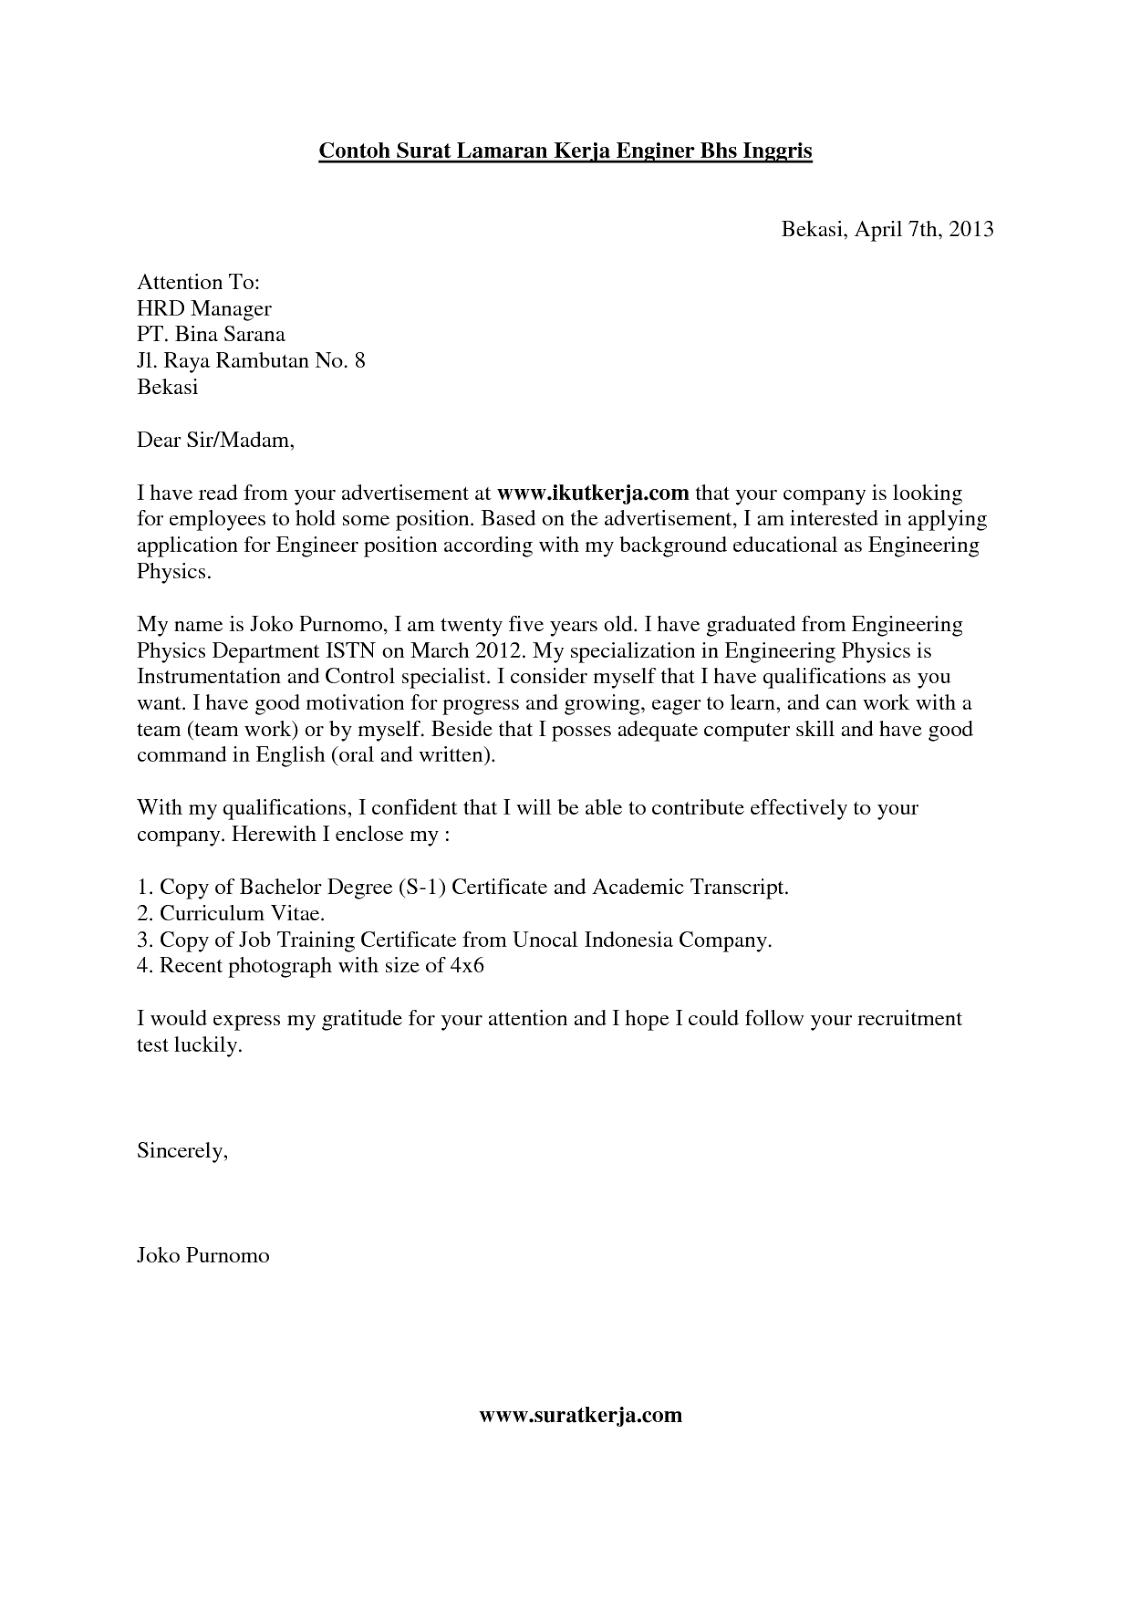 Contoh application letter untuk job fair on